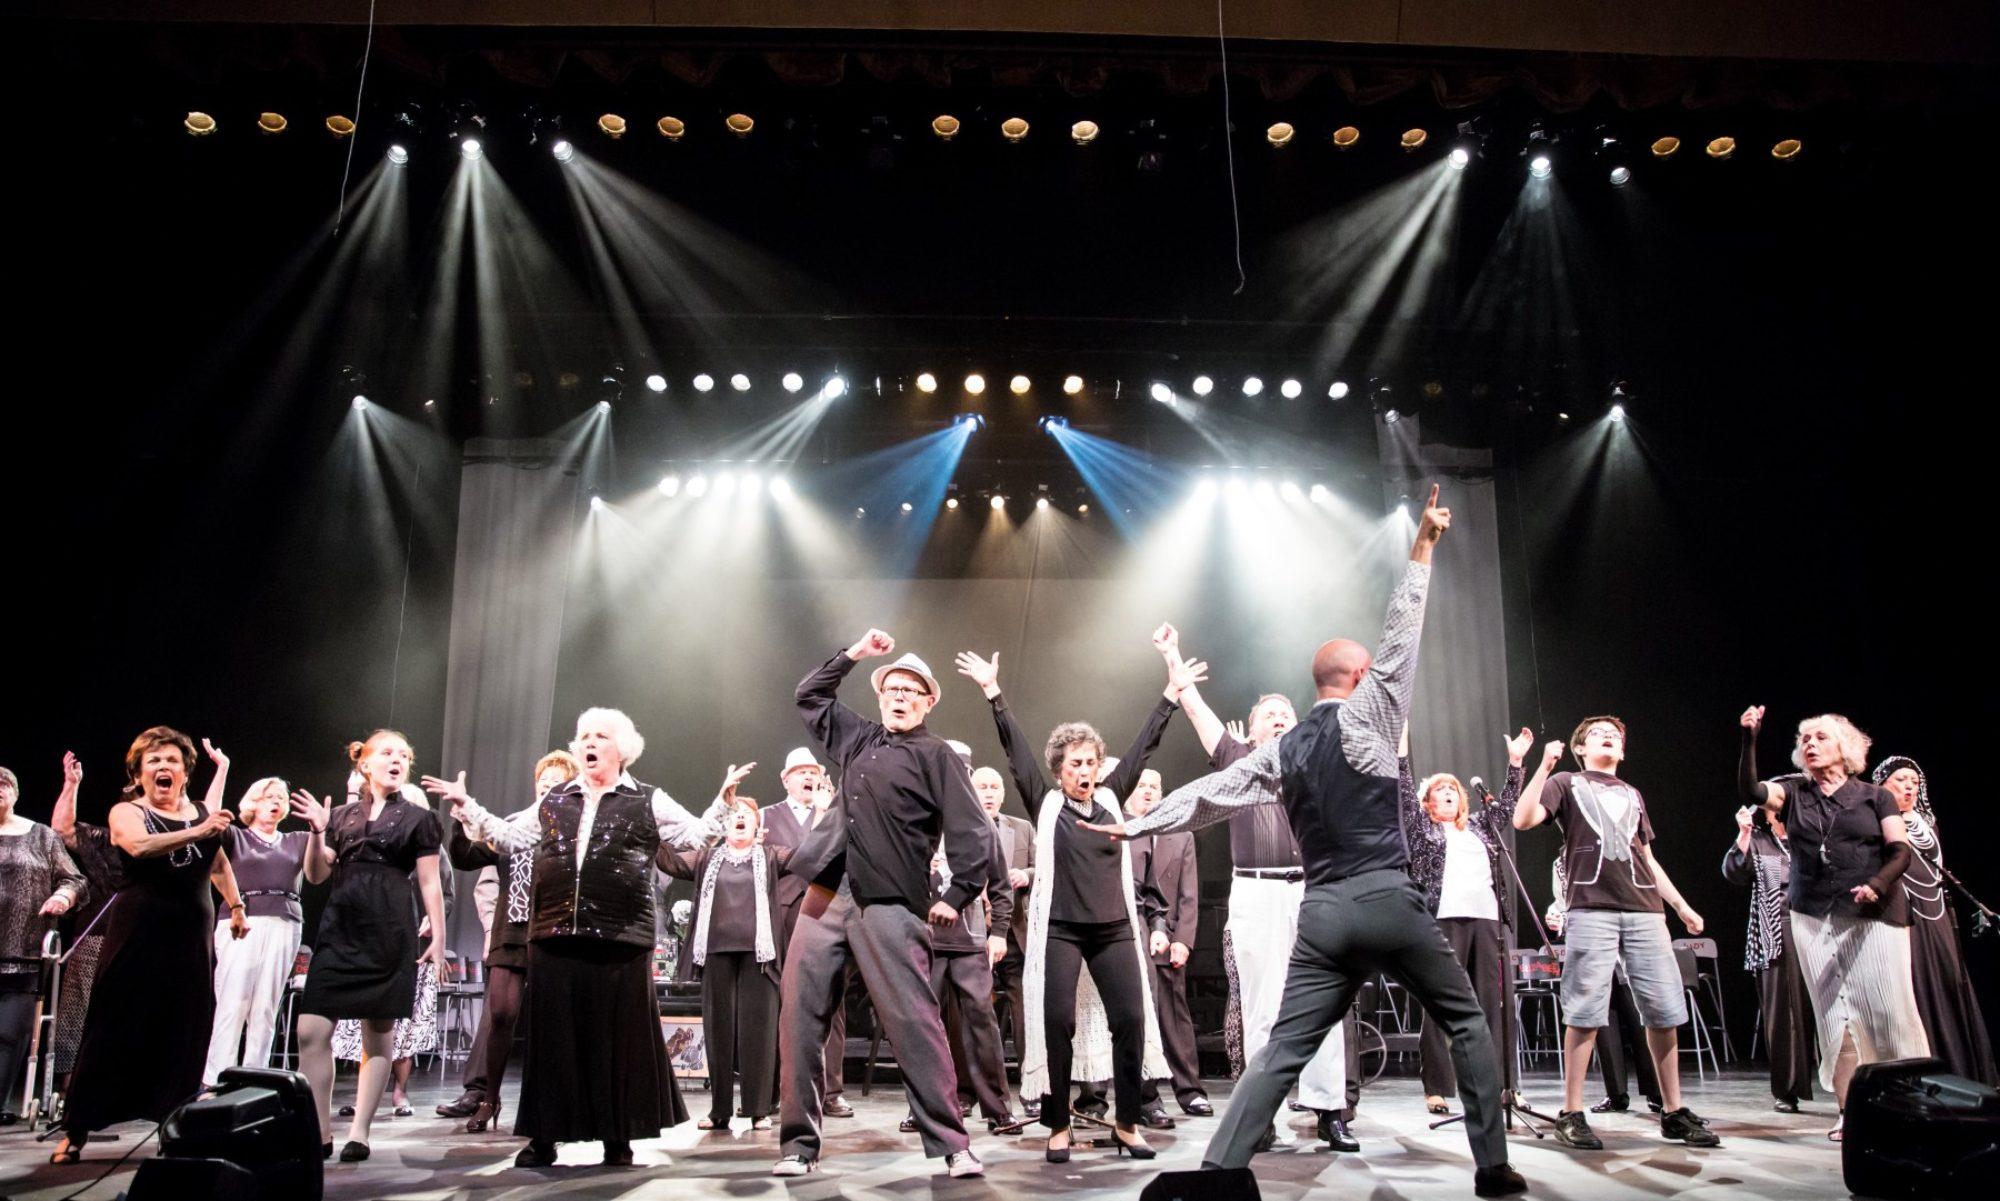 Caption: Senior Singing Ensemble Alive & Kickin, Credit: photo: courtesy of Alive & Kickin